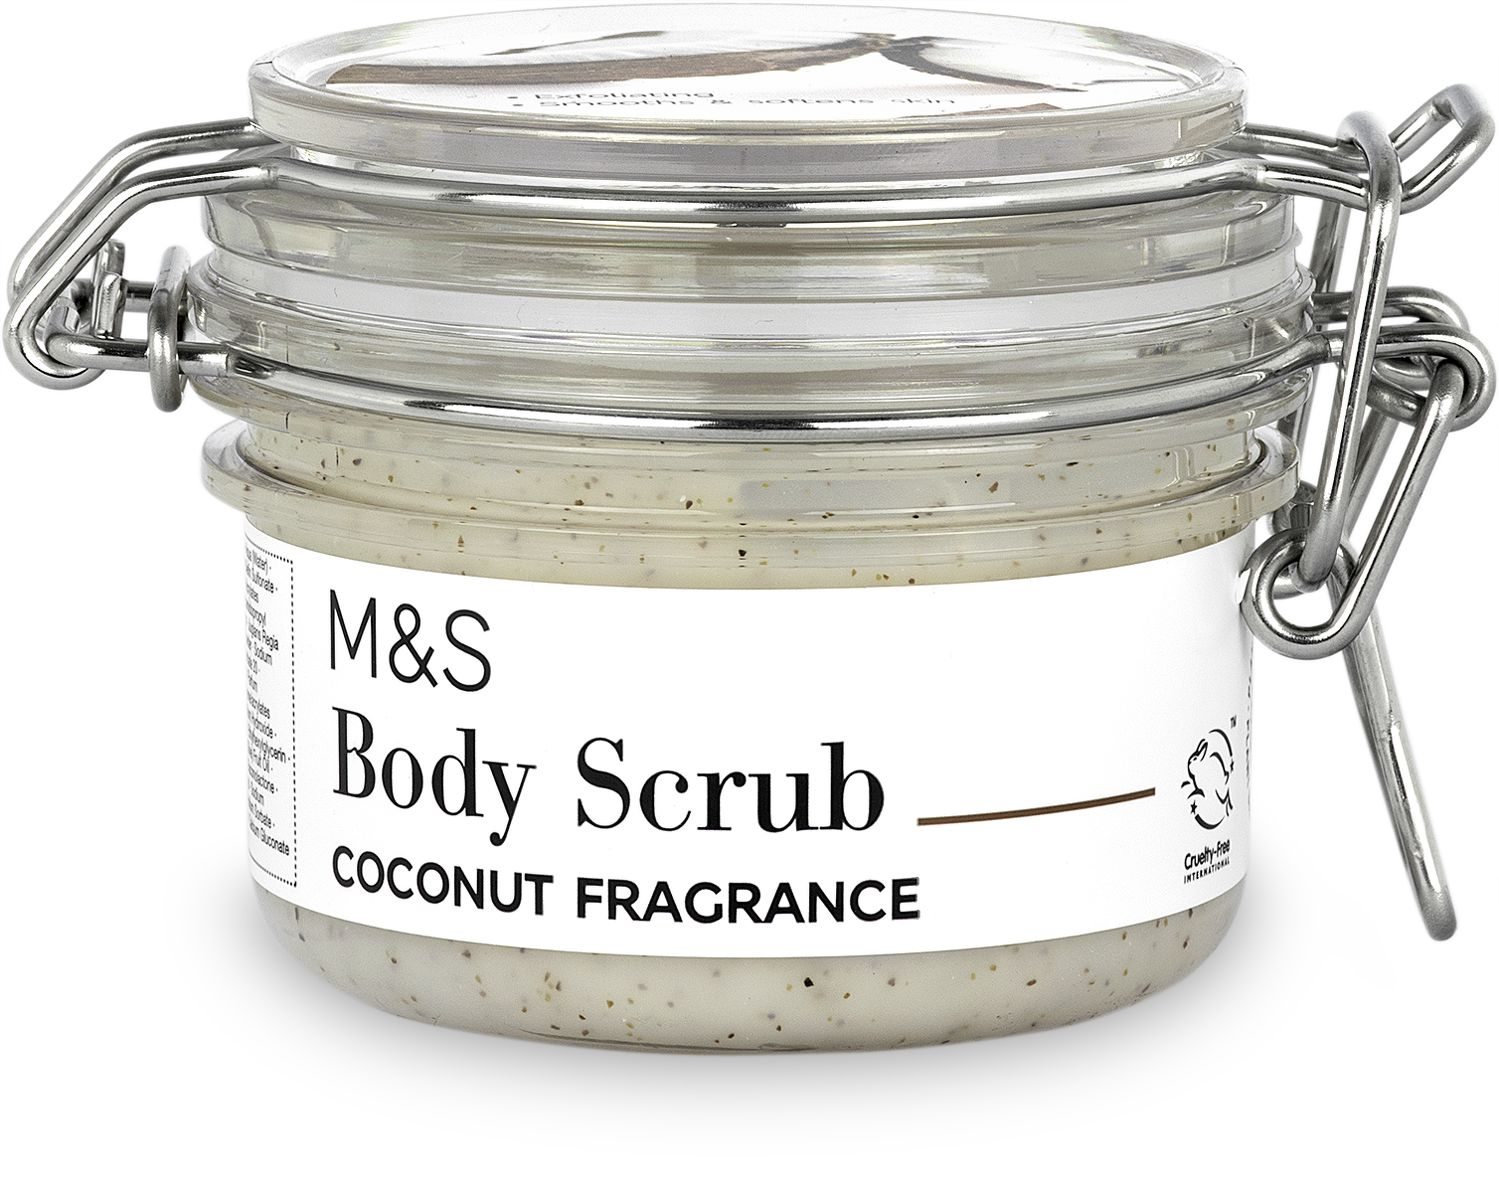 Body-Scrub-Coconut-Fragrance - THE EDGE SINGAPORE